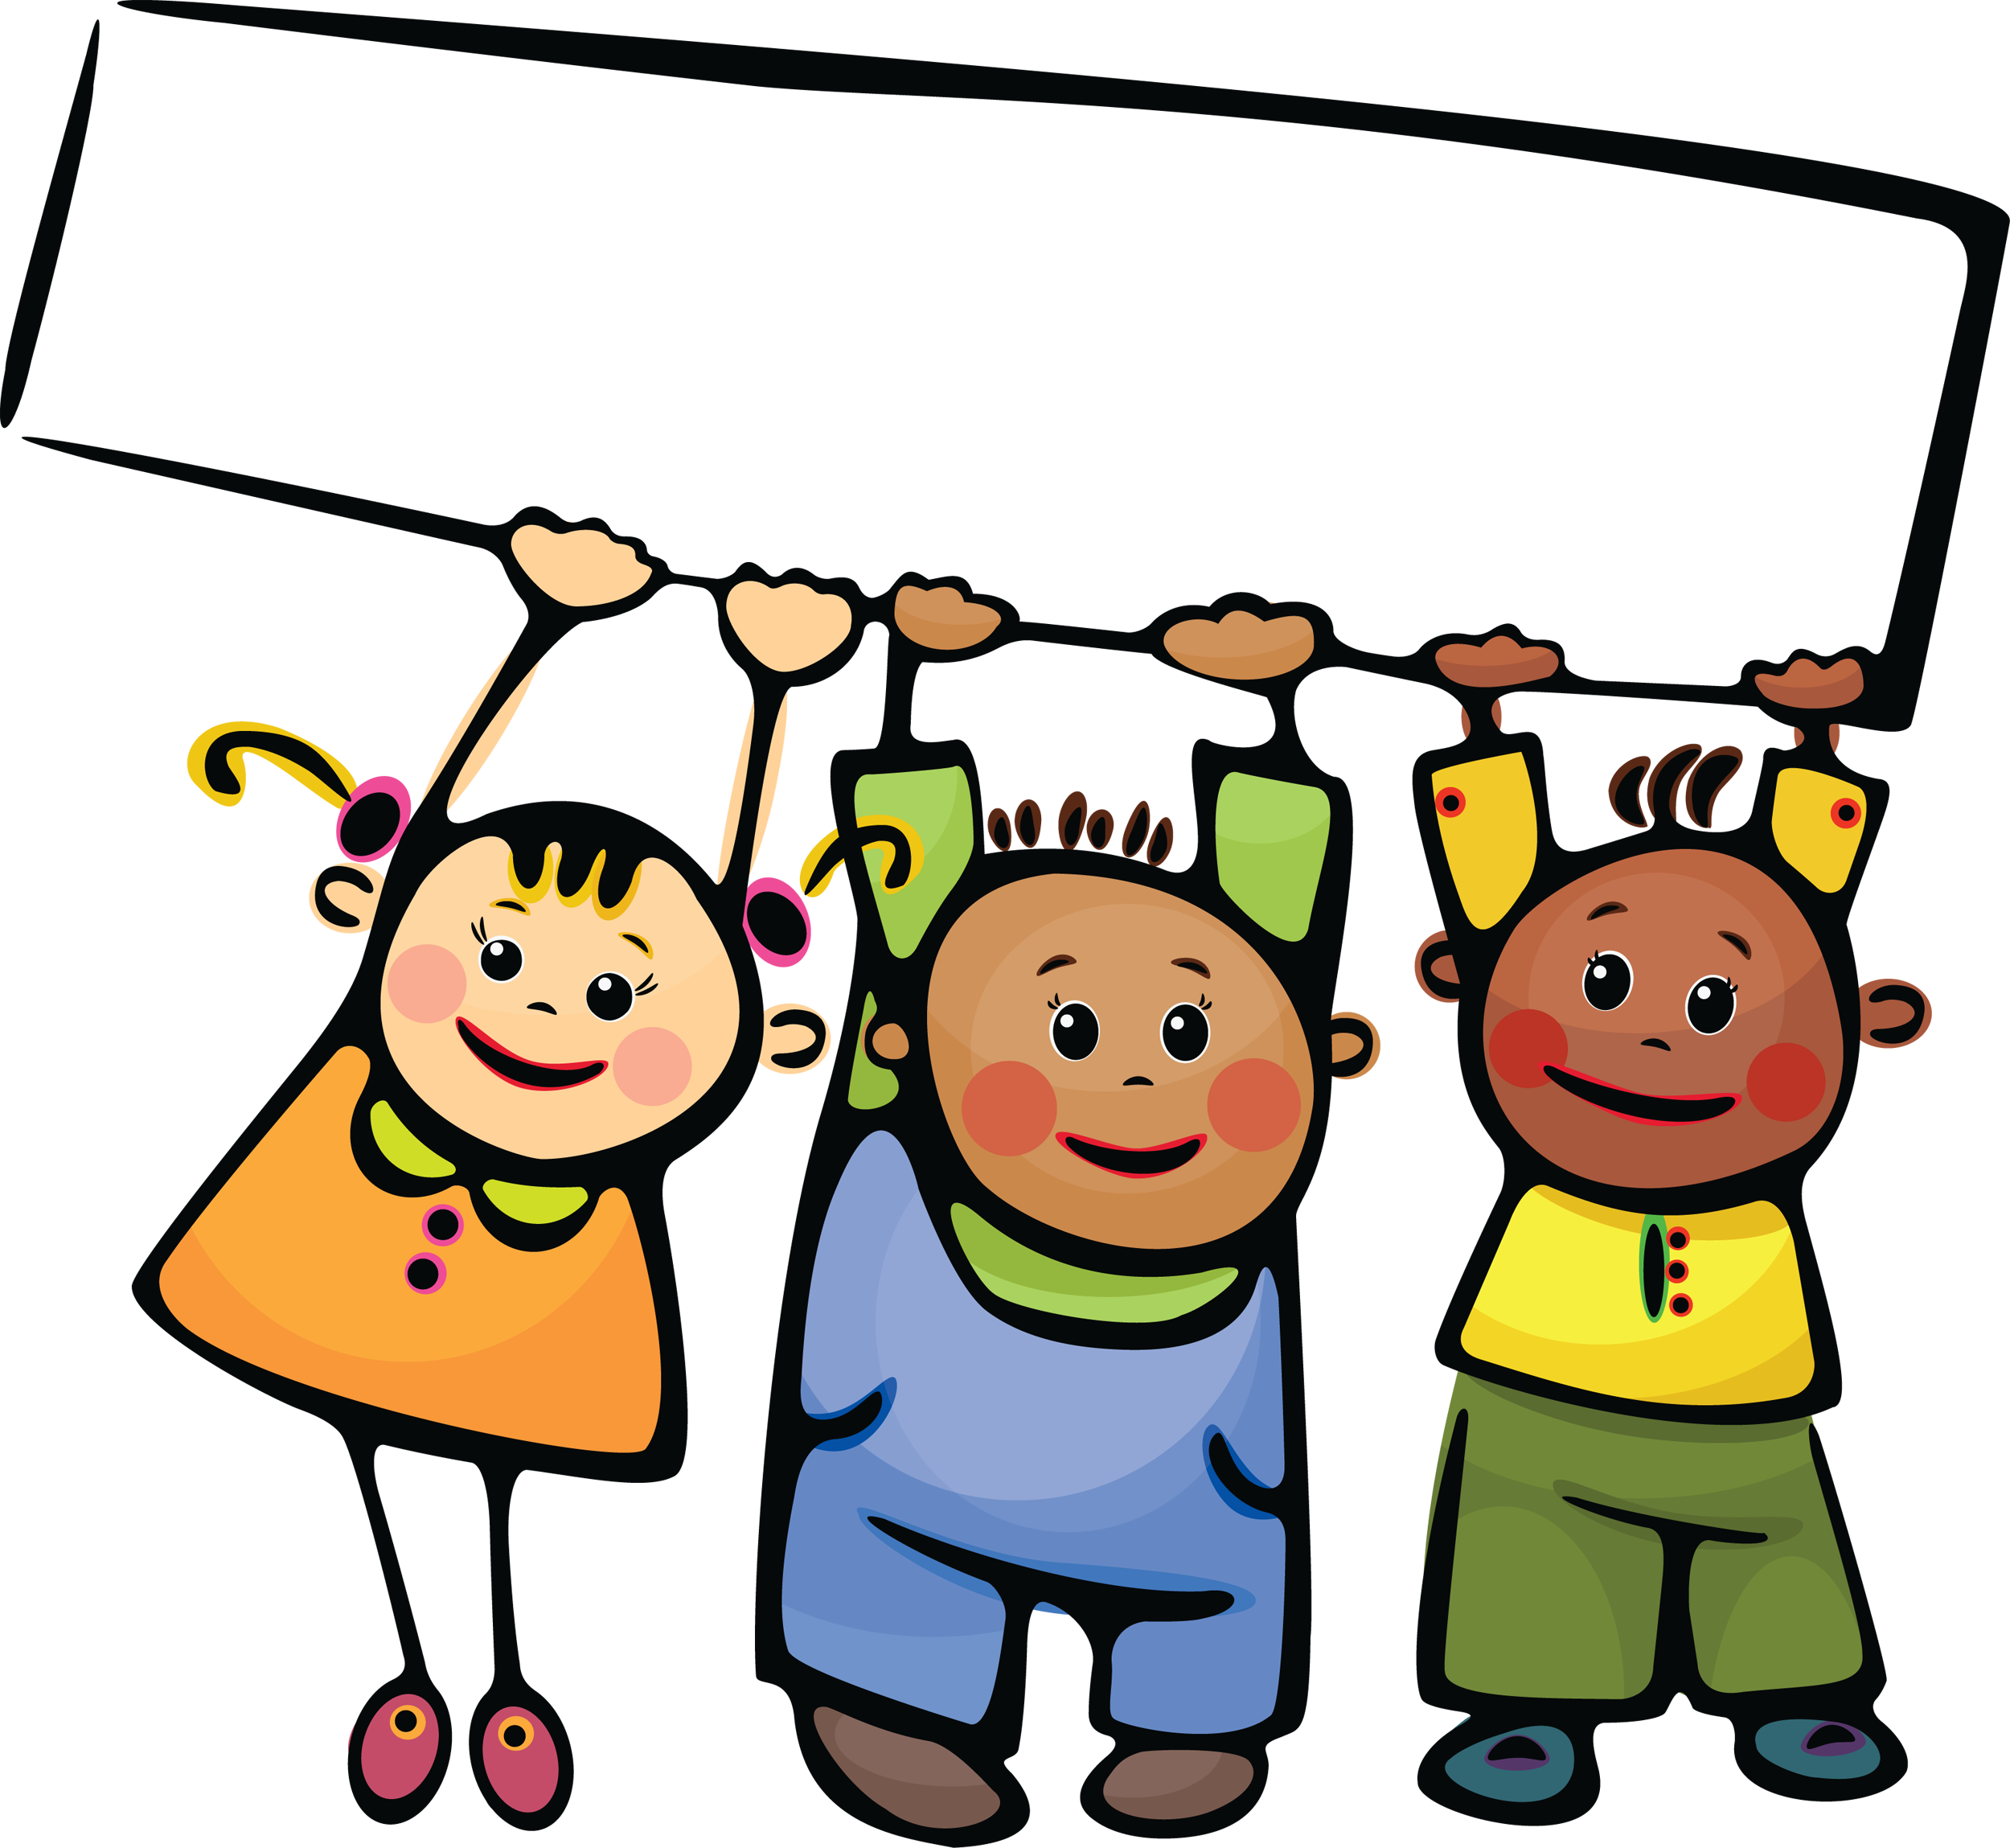 Картинки на прозрачном фоне для детей (46 фото)